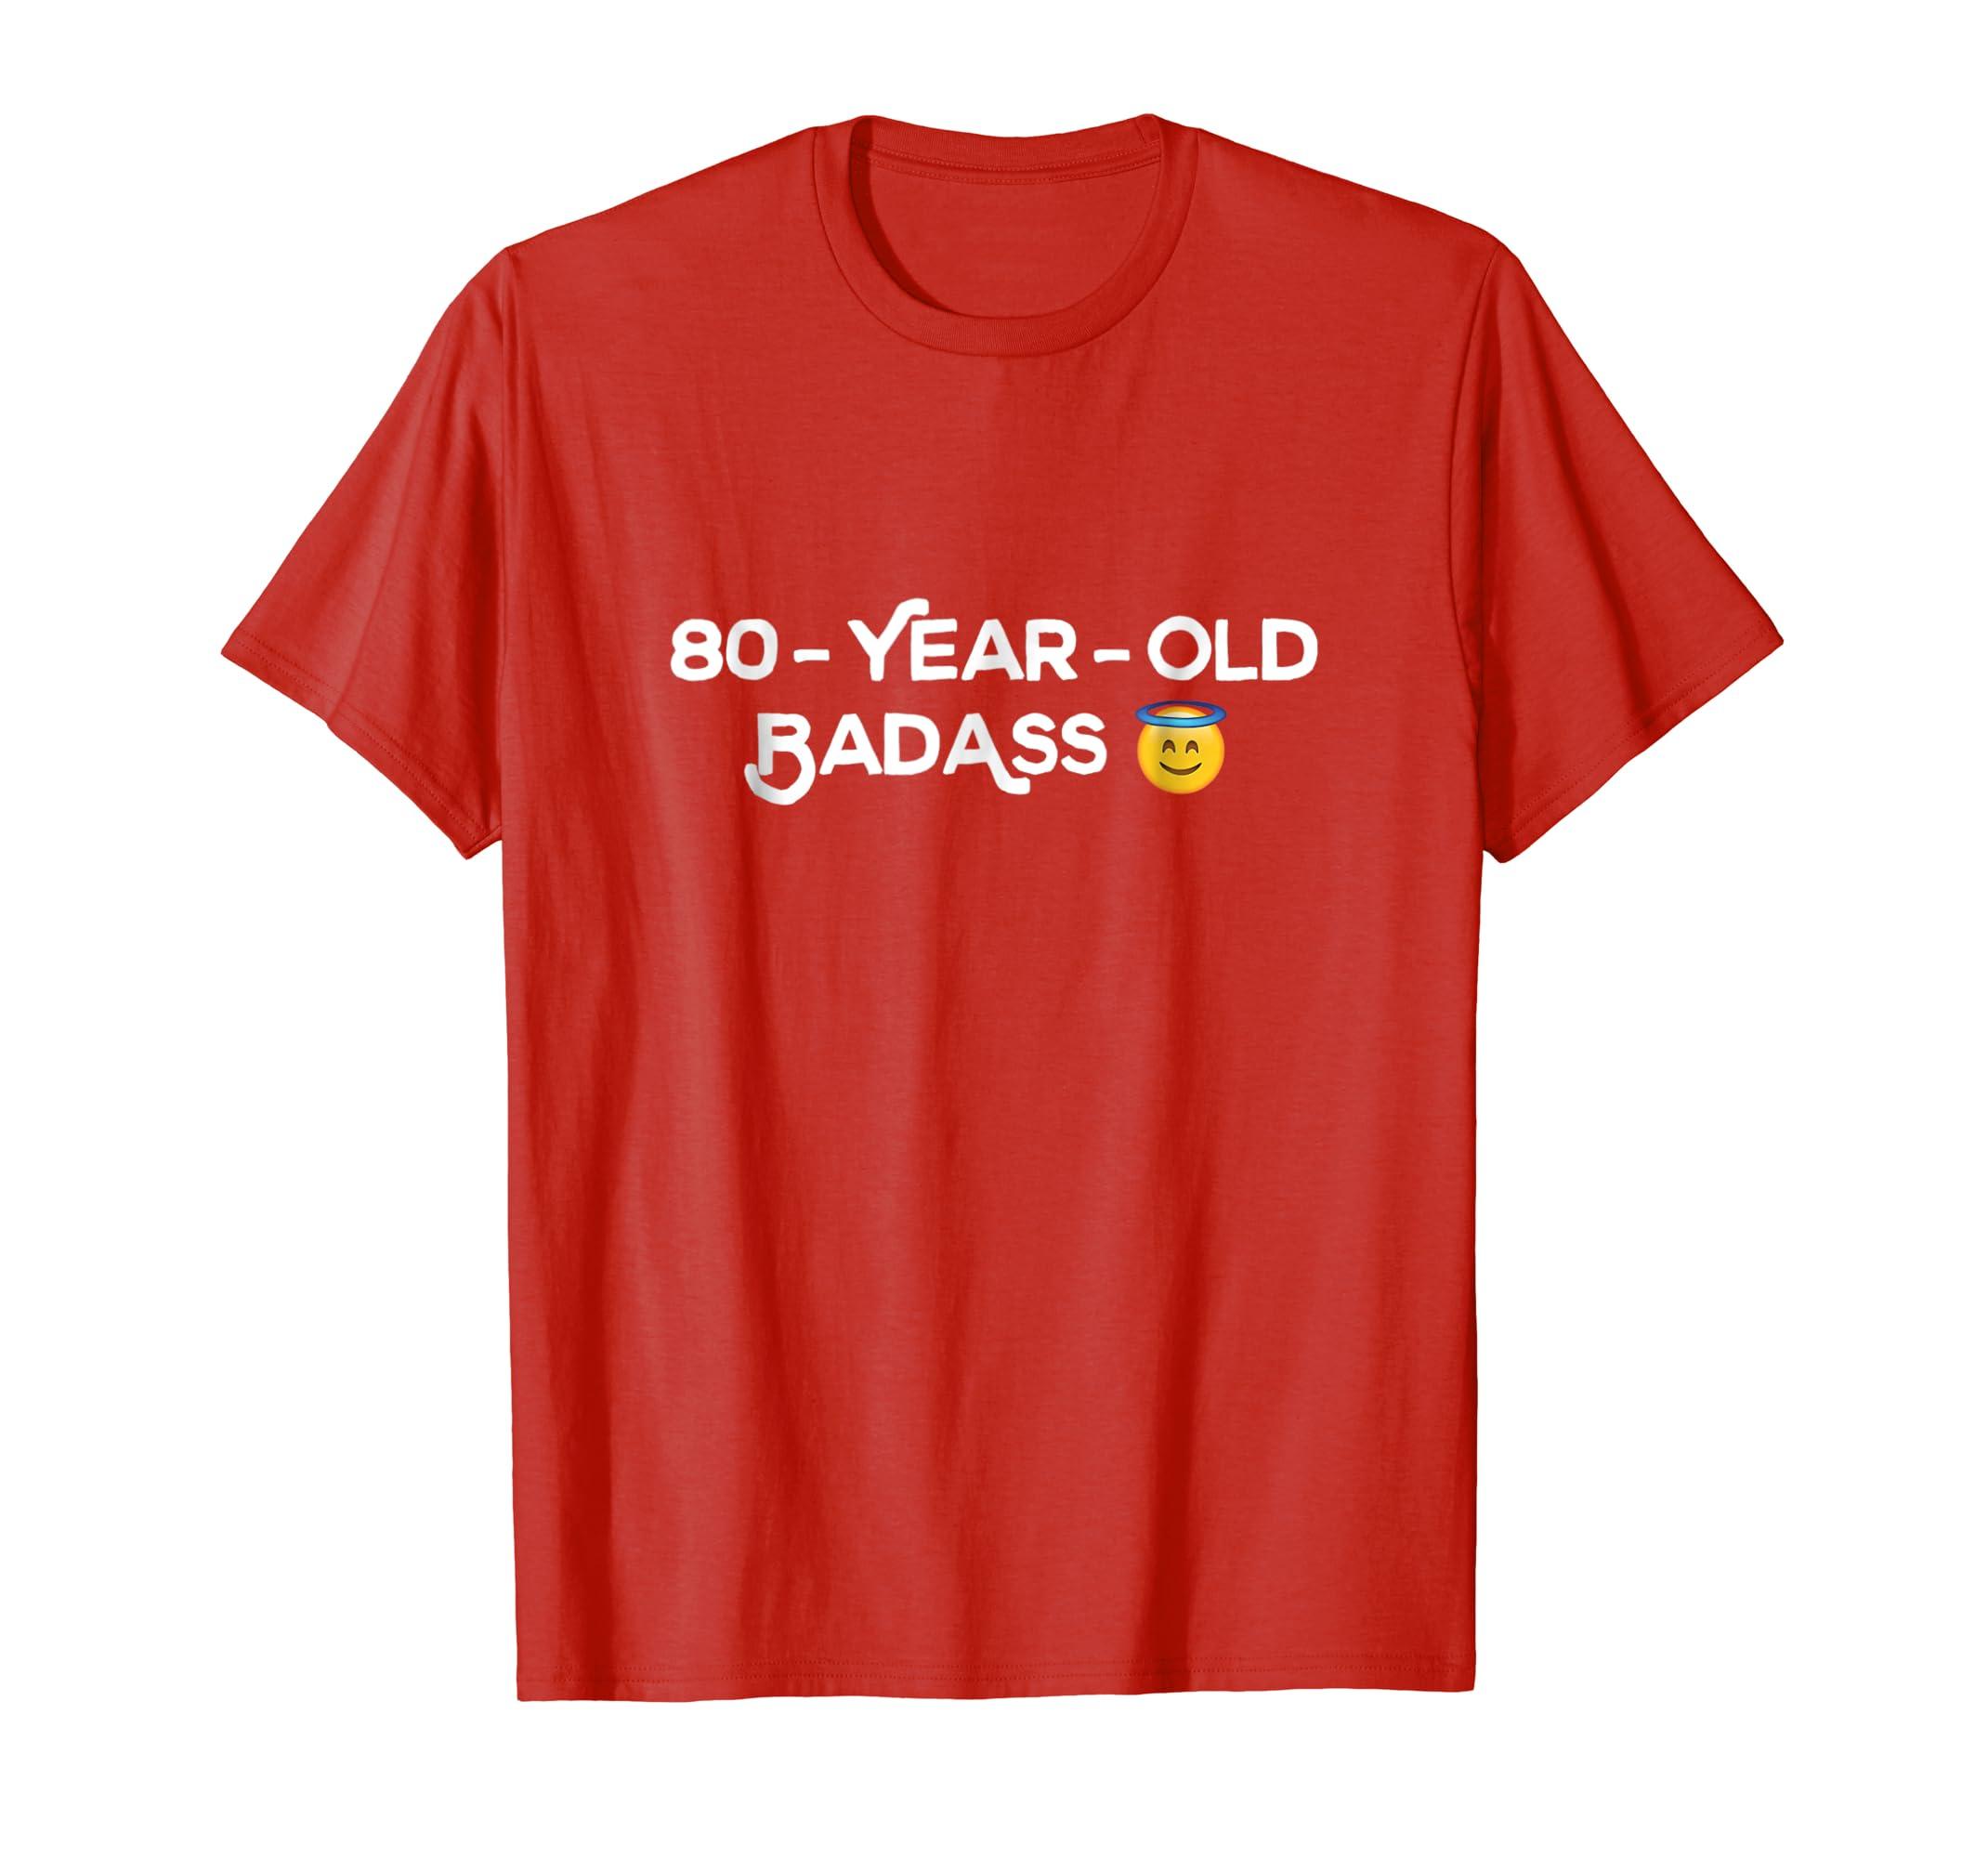 Amazon 80 Year Old Badass 80th Birthday Gift Grandma Grampa T Shirt Clothing